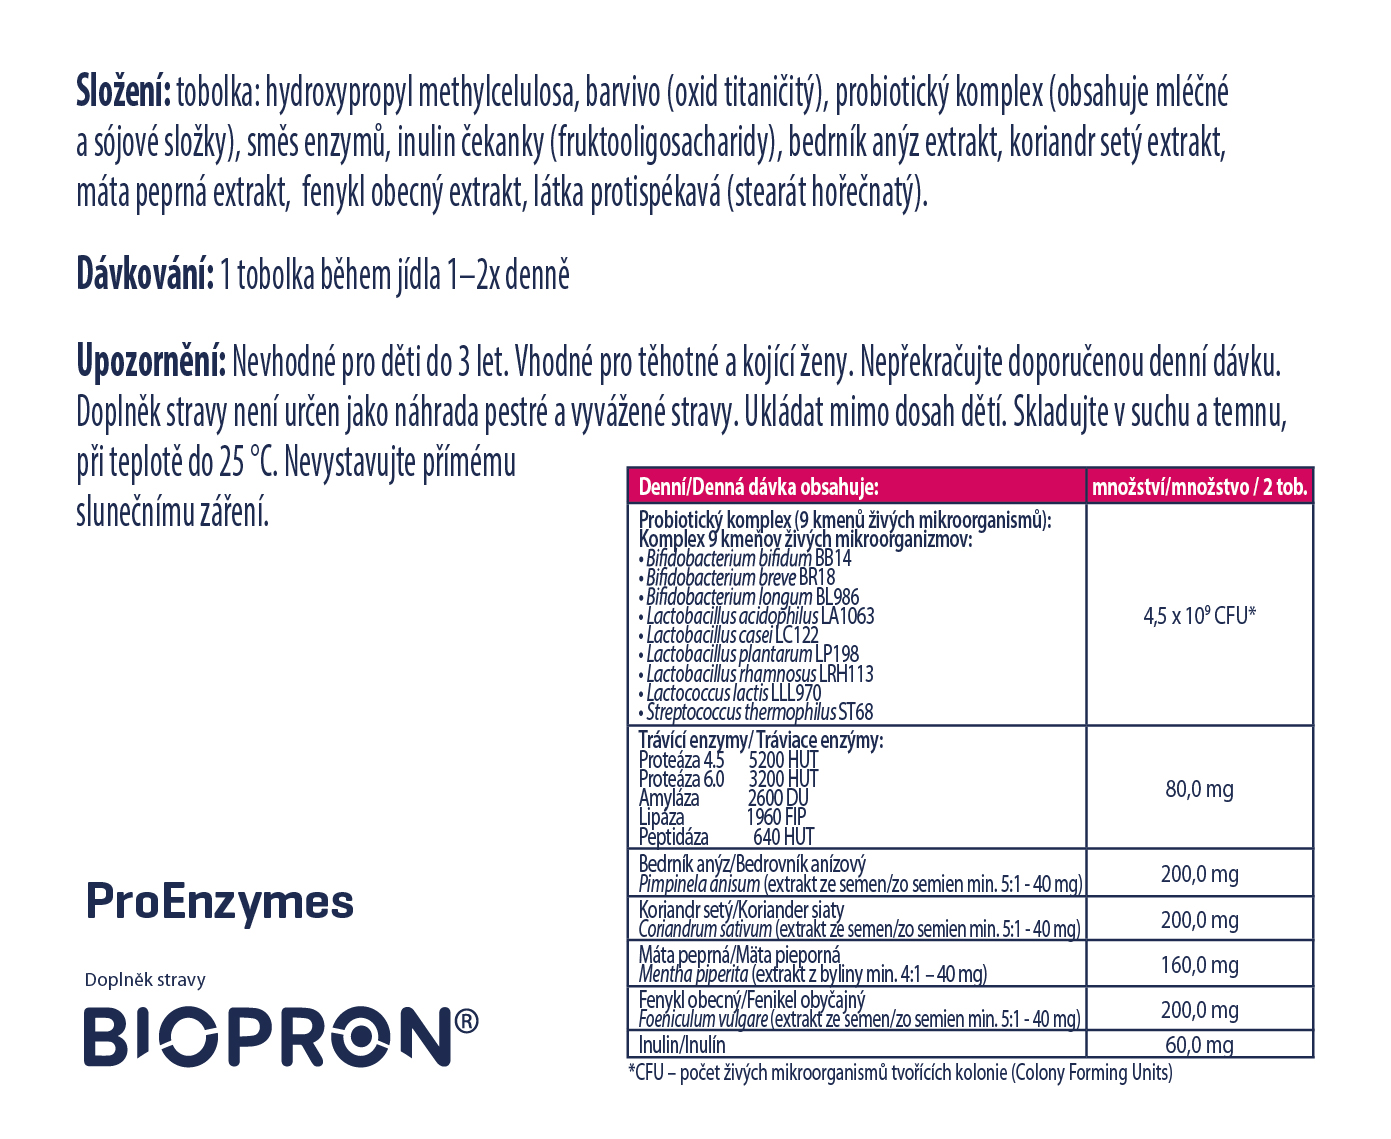 Biopron ProEnzymes